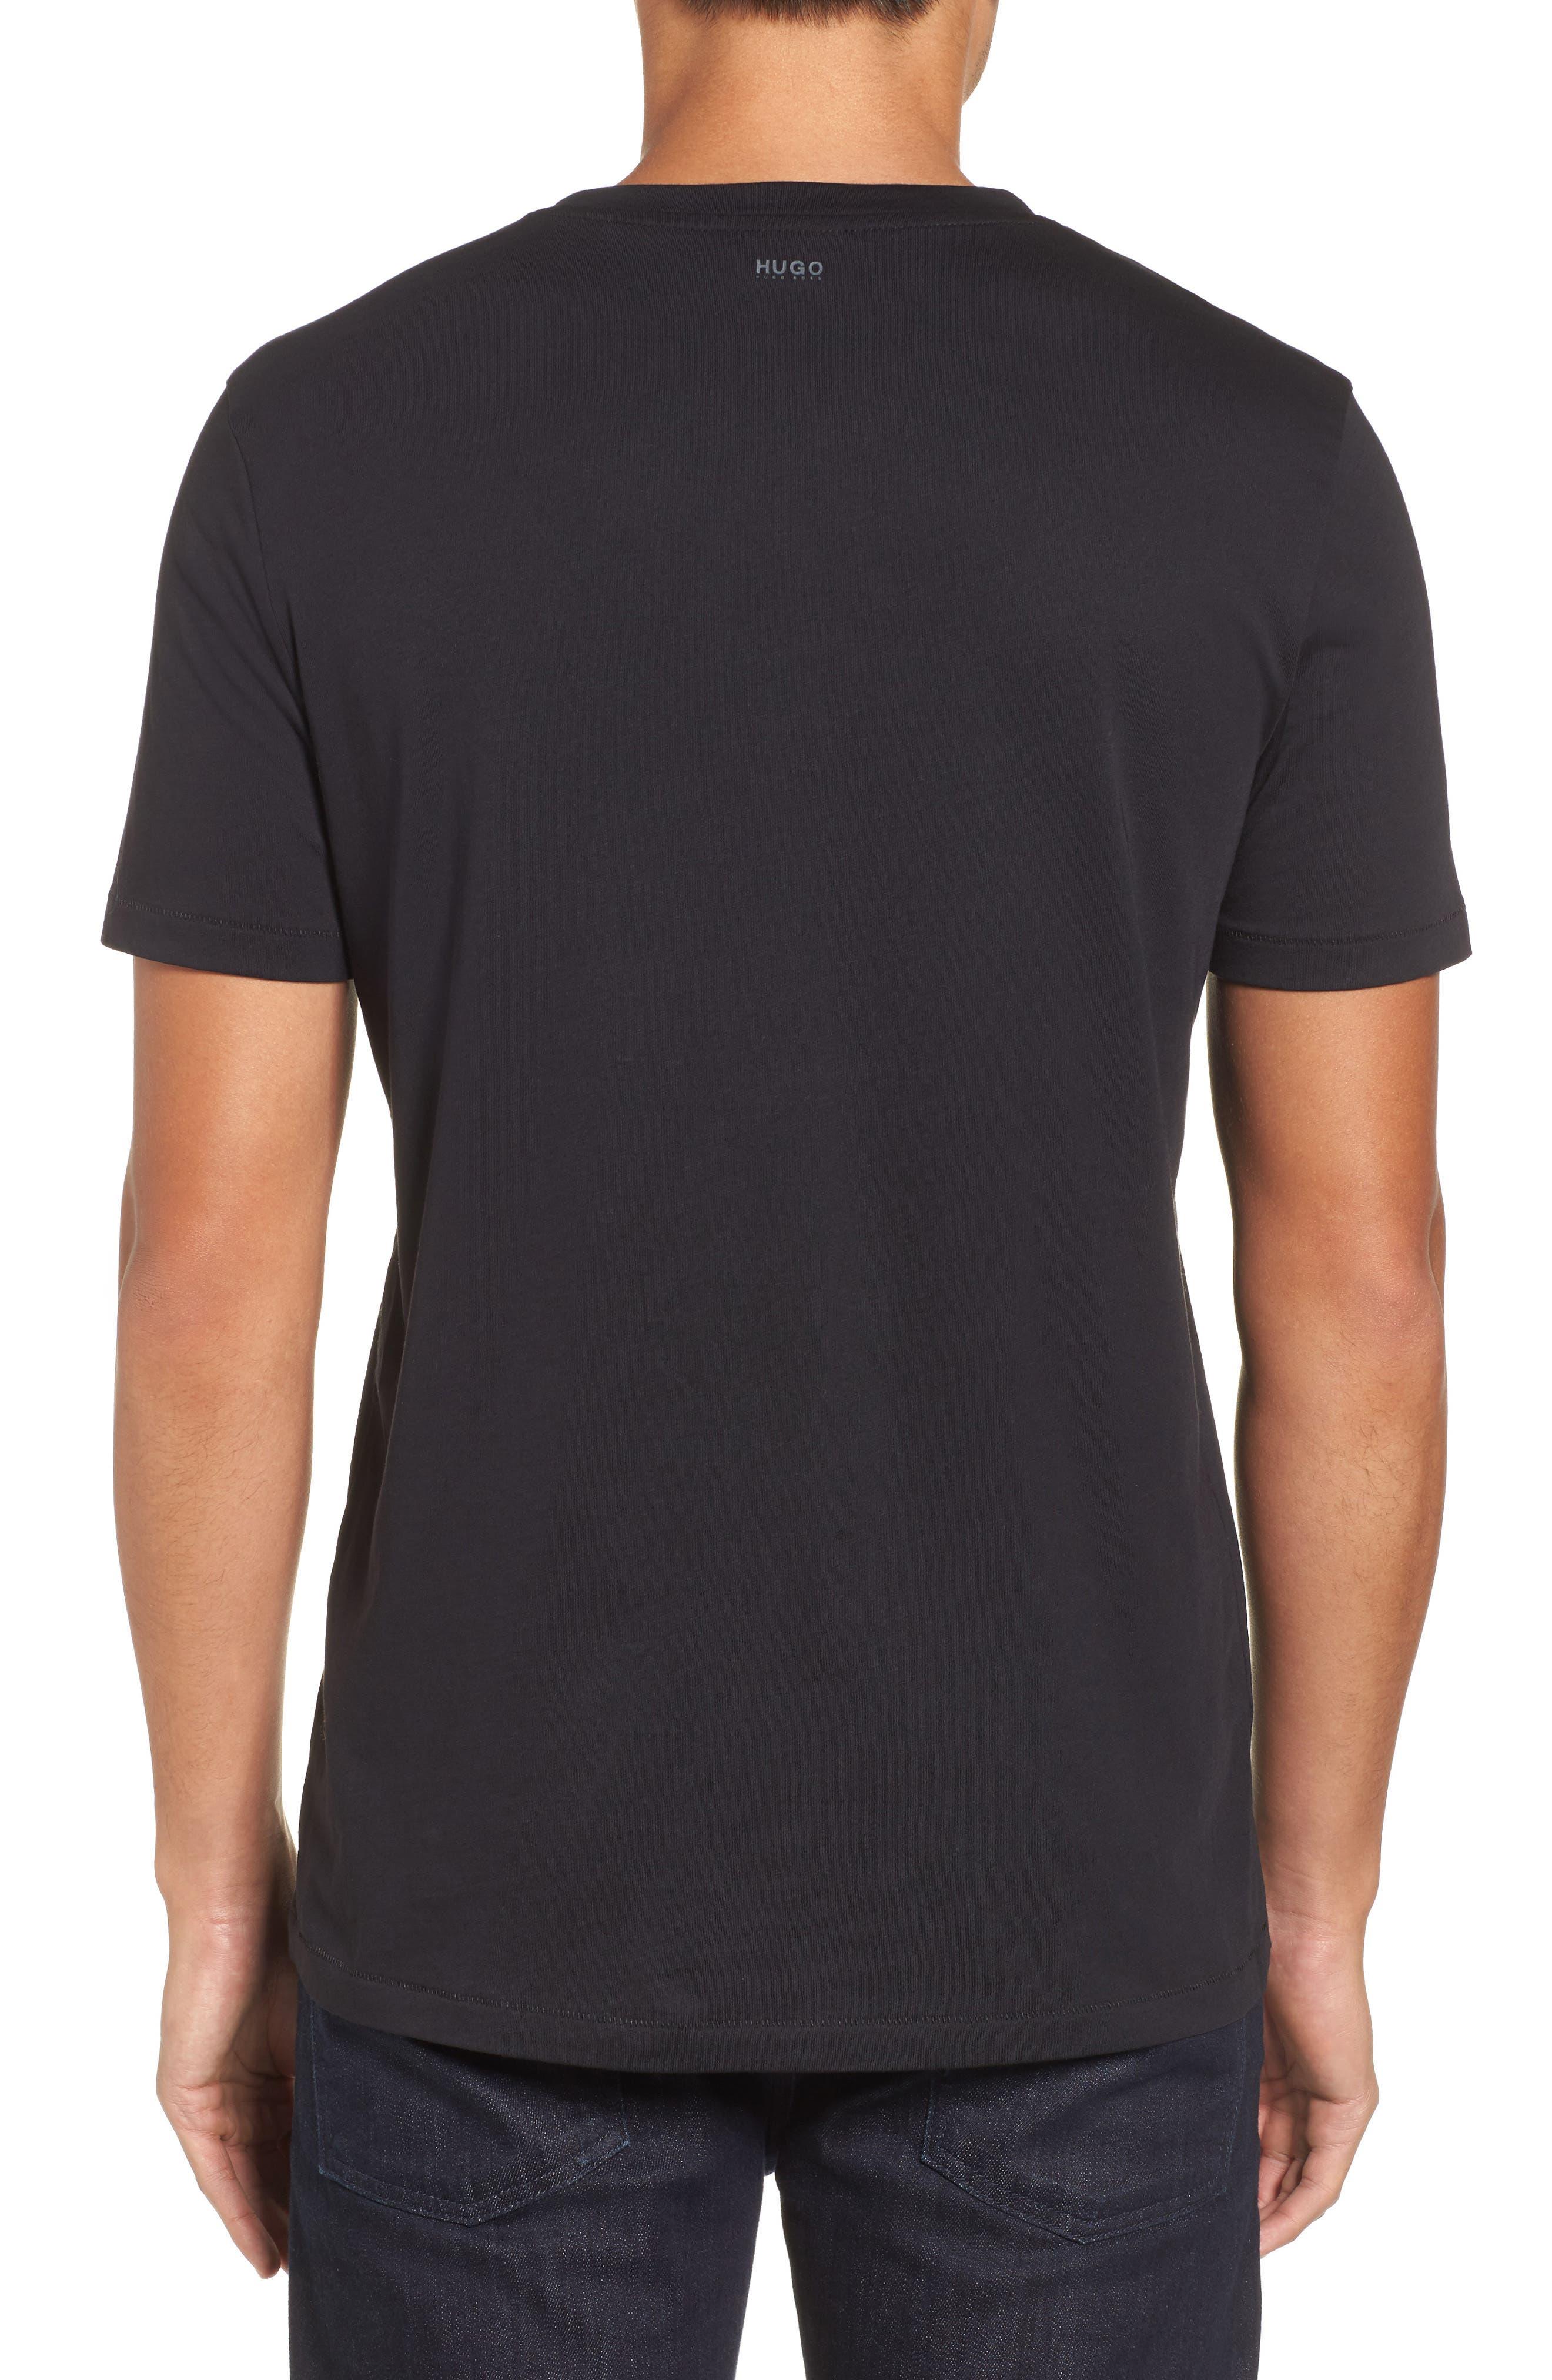 Hugo Boss Drison Hashmark Graphic T-Shirt,                             Alternate thumbnail 2, color,